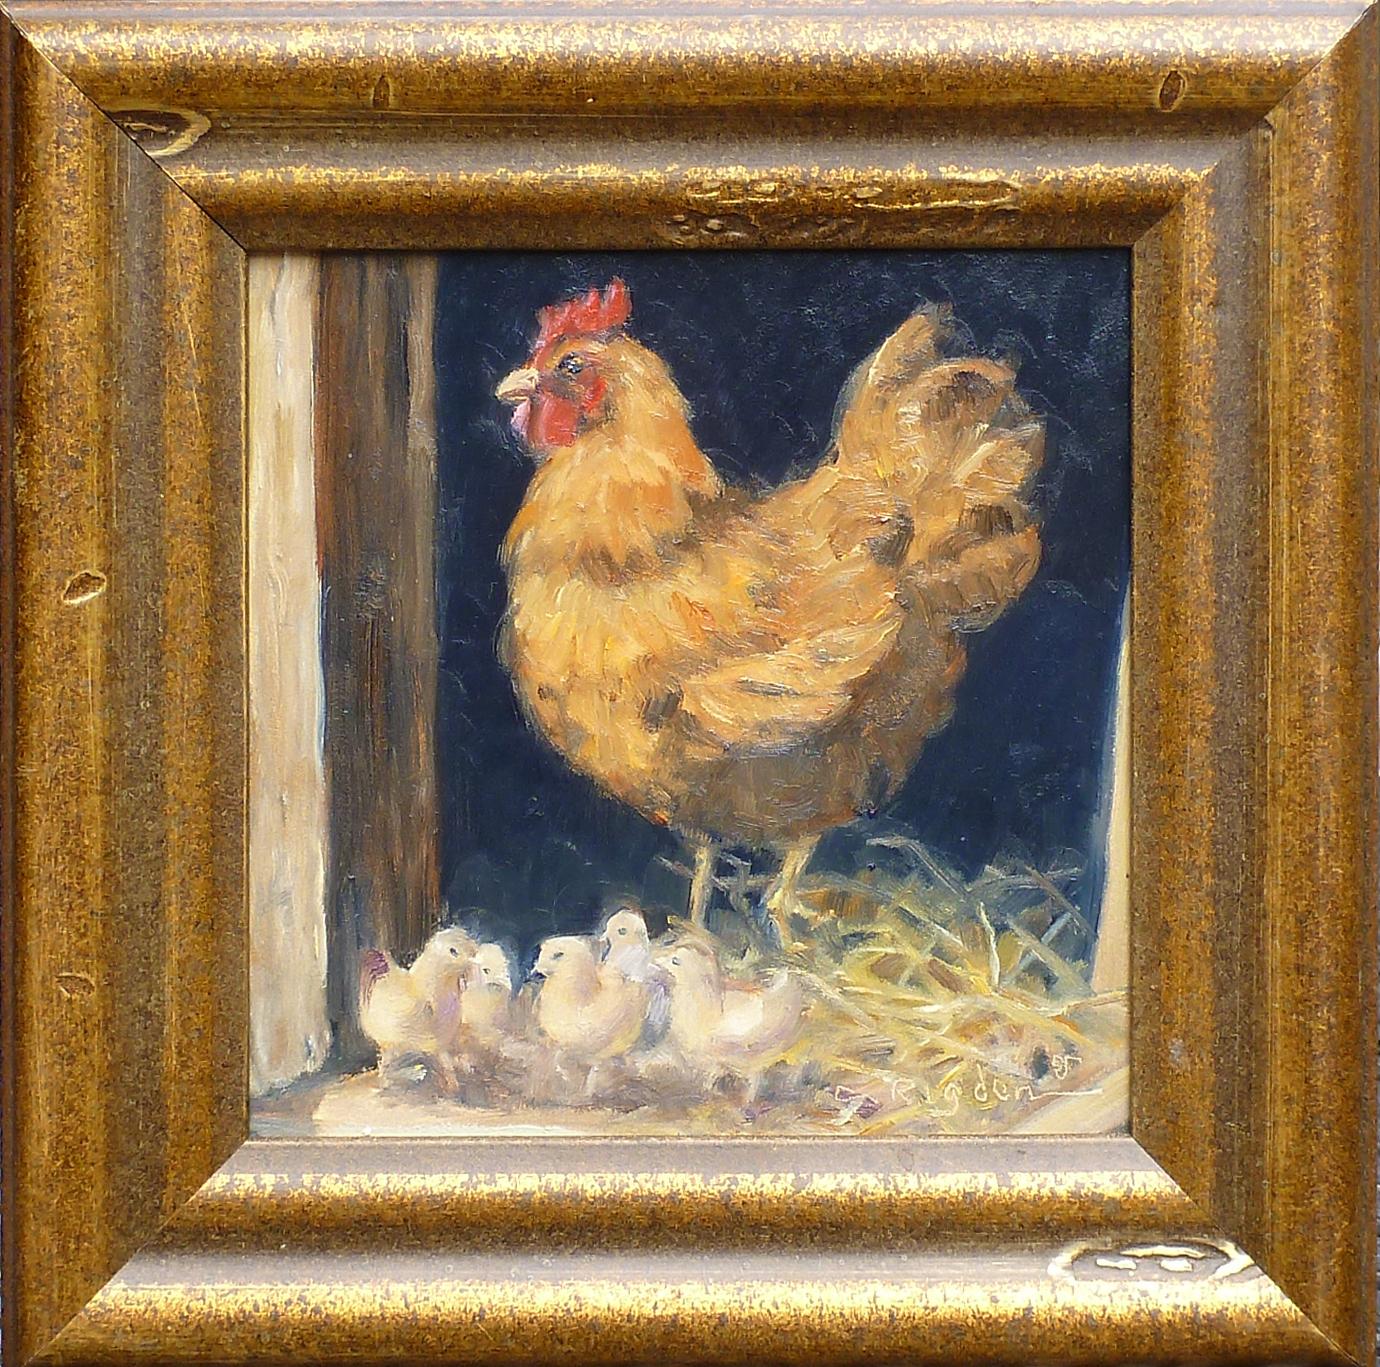 Hen & Chicks by Ms. Cynthia Rigden - Masterpiece Online